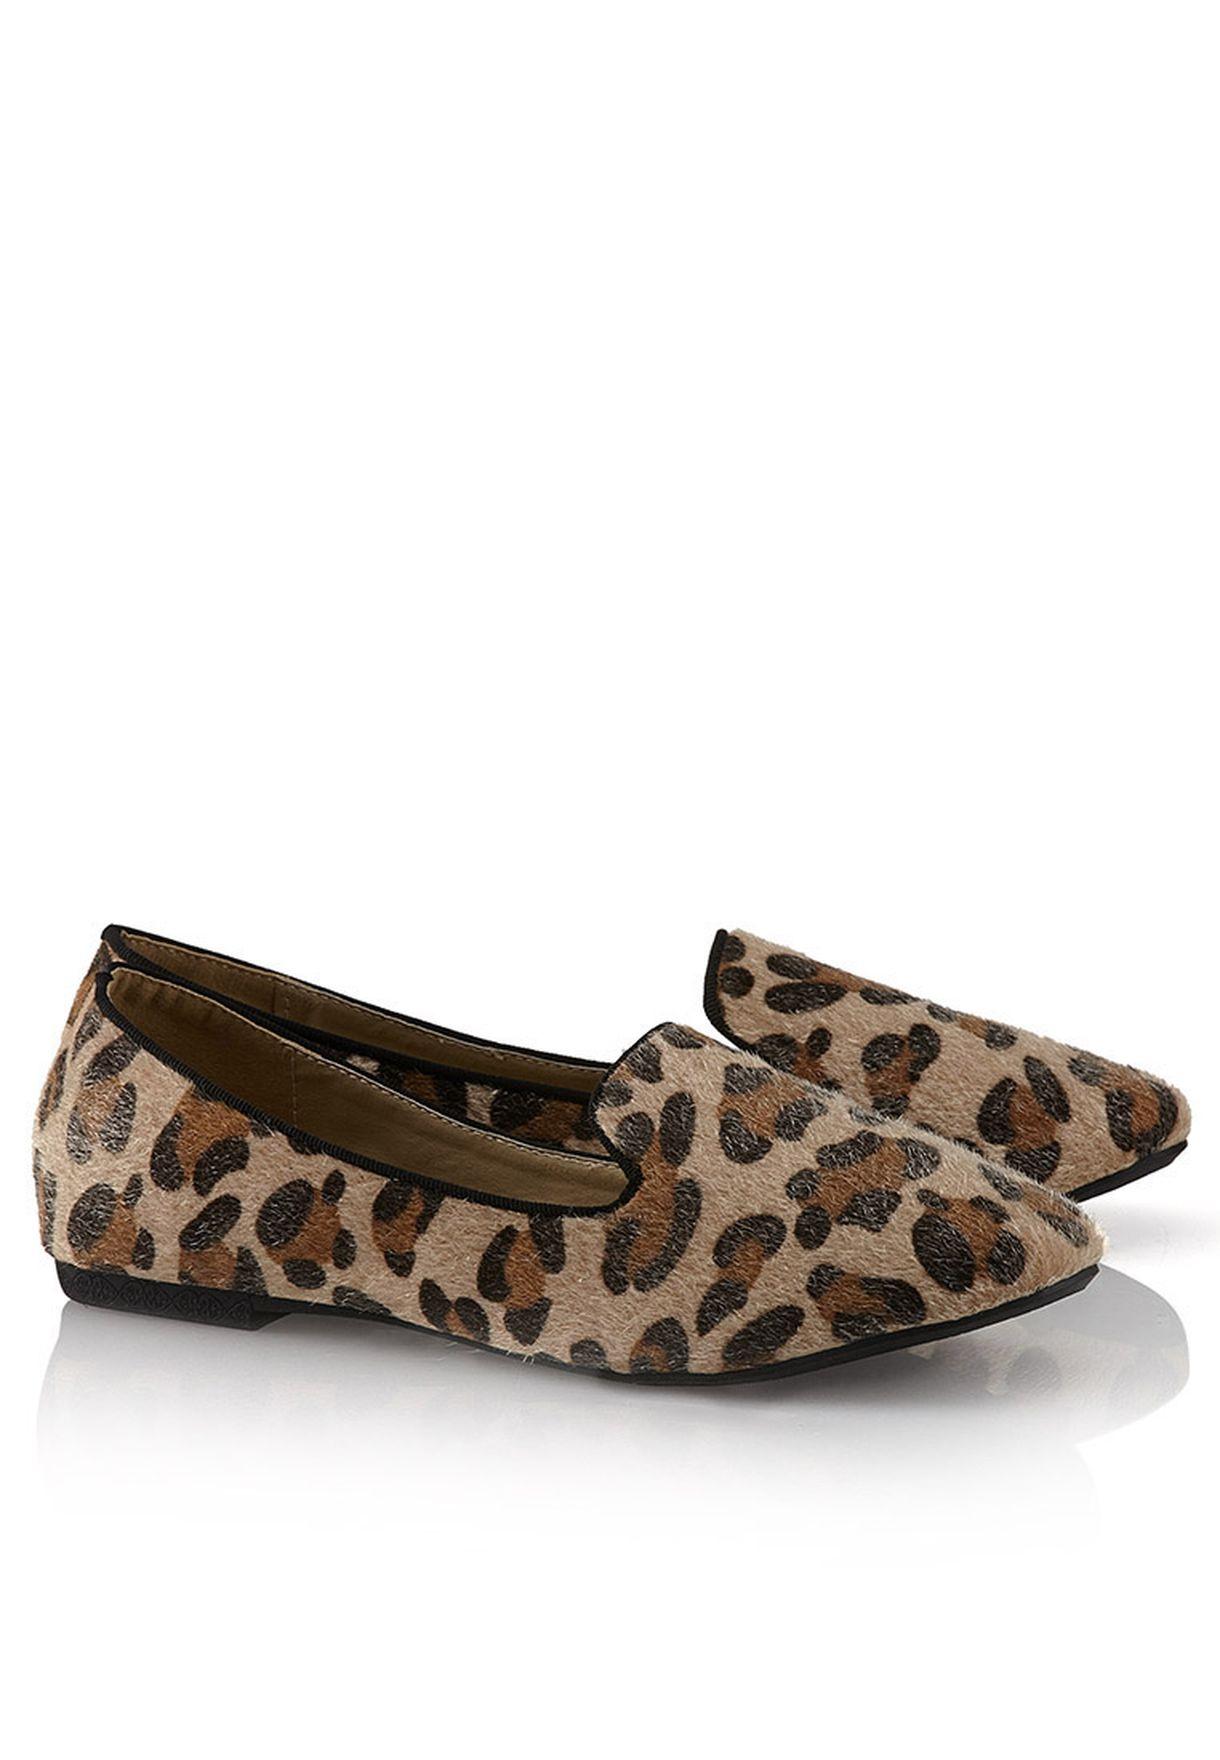 dadd264971098 تسوق حذاء بطبعات حيوانات ماركة سبوت اون لون طبعات الحيوانات في ...